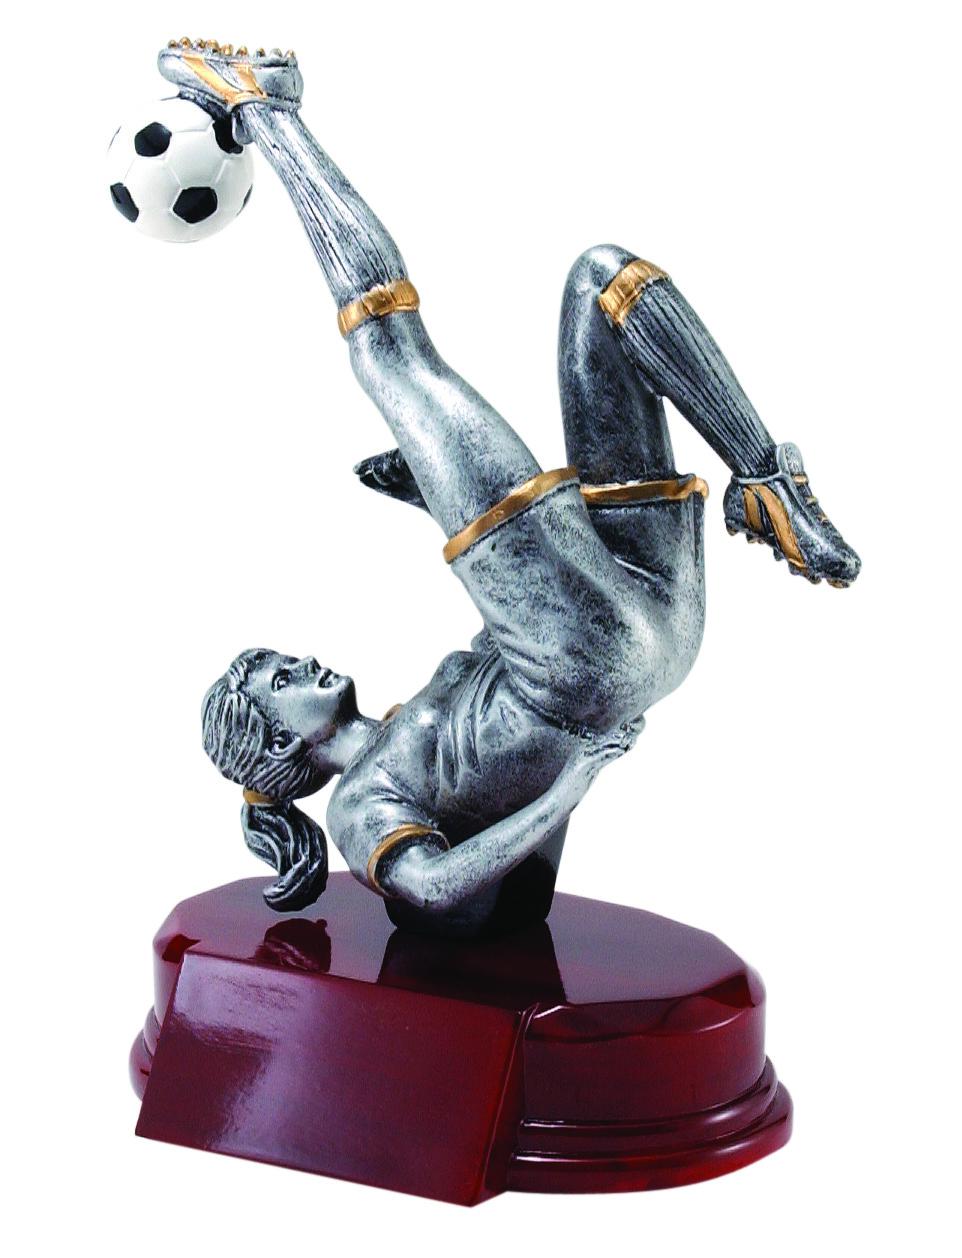 "Soccer, Female:   Large - RFC-1130 - 8.25""  Medium - RFC-930 - 7.25""  Small - RFC-730 - 5.25"""